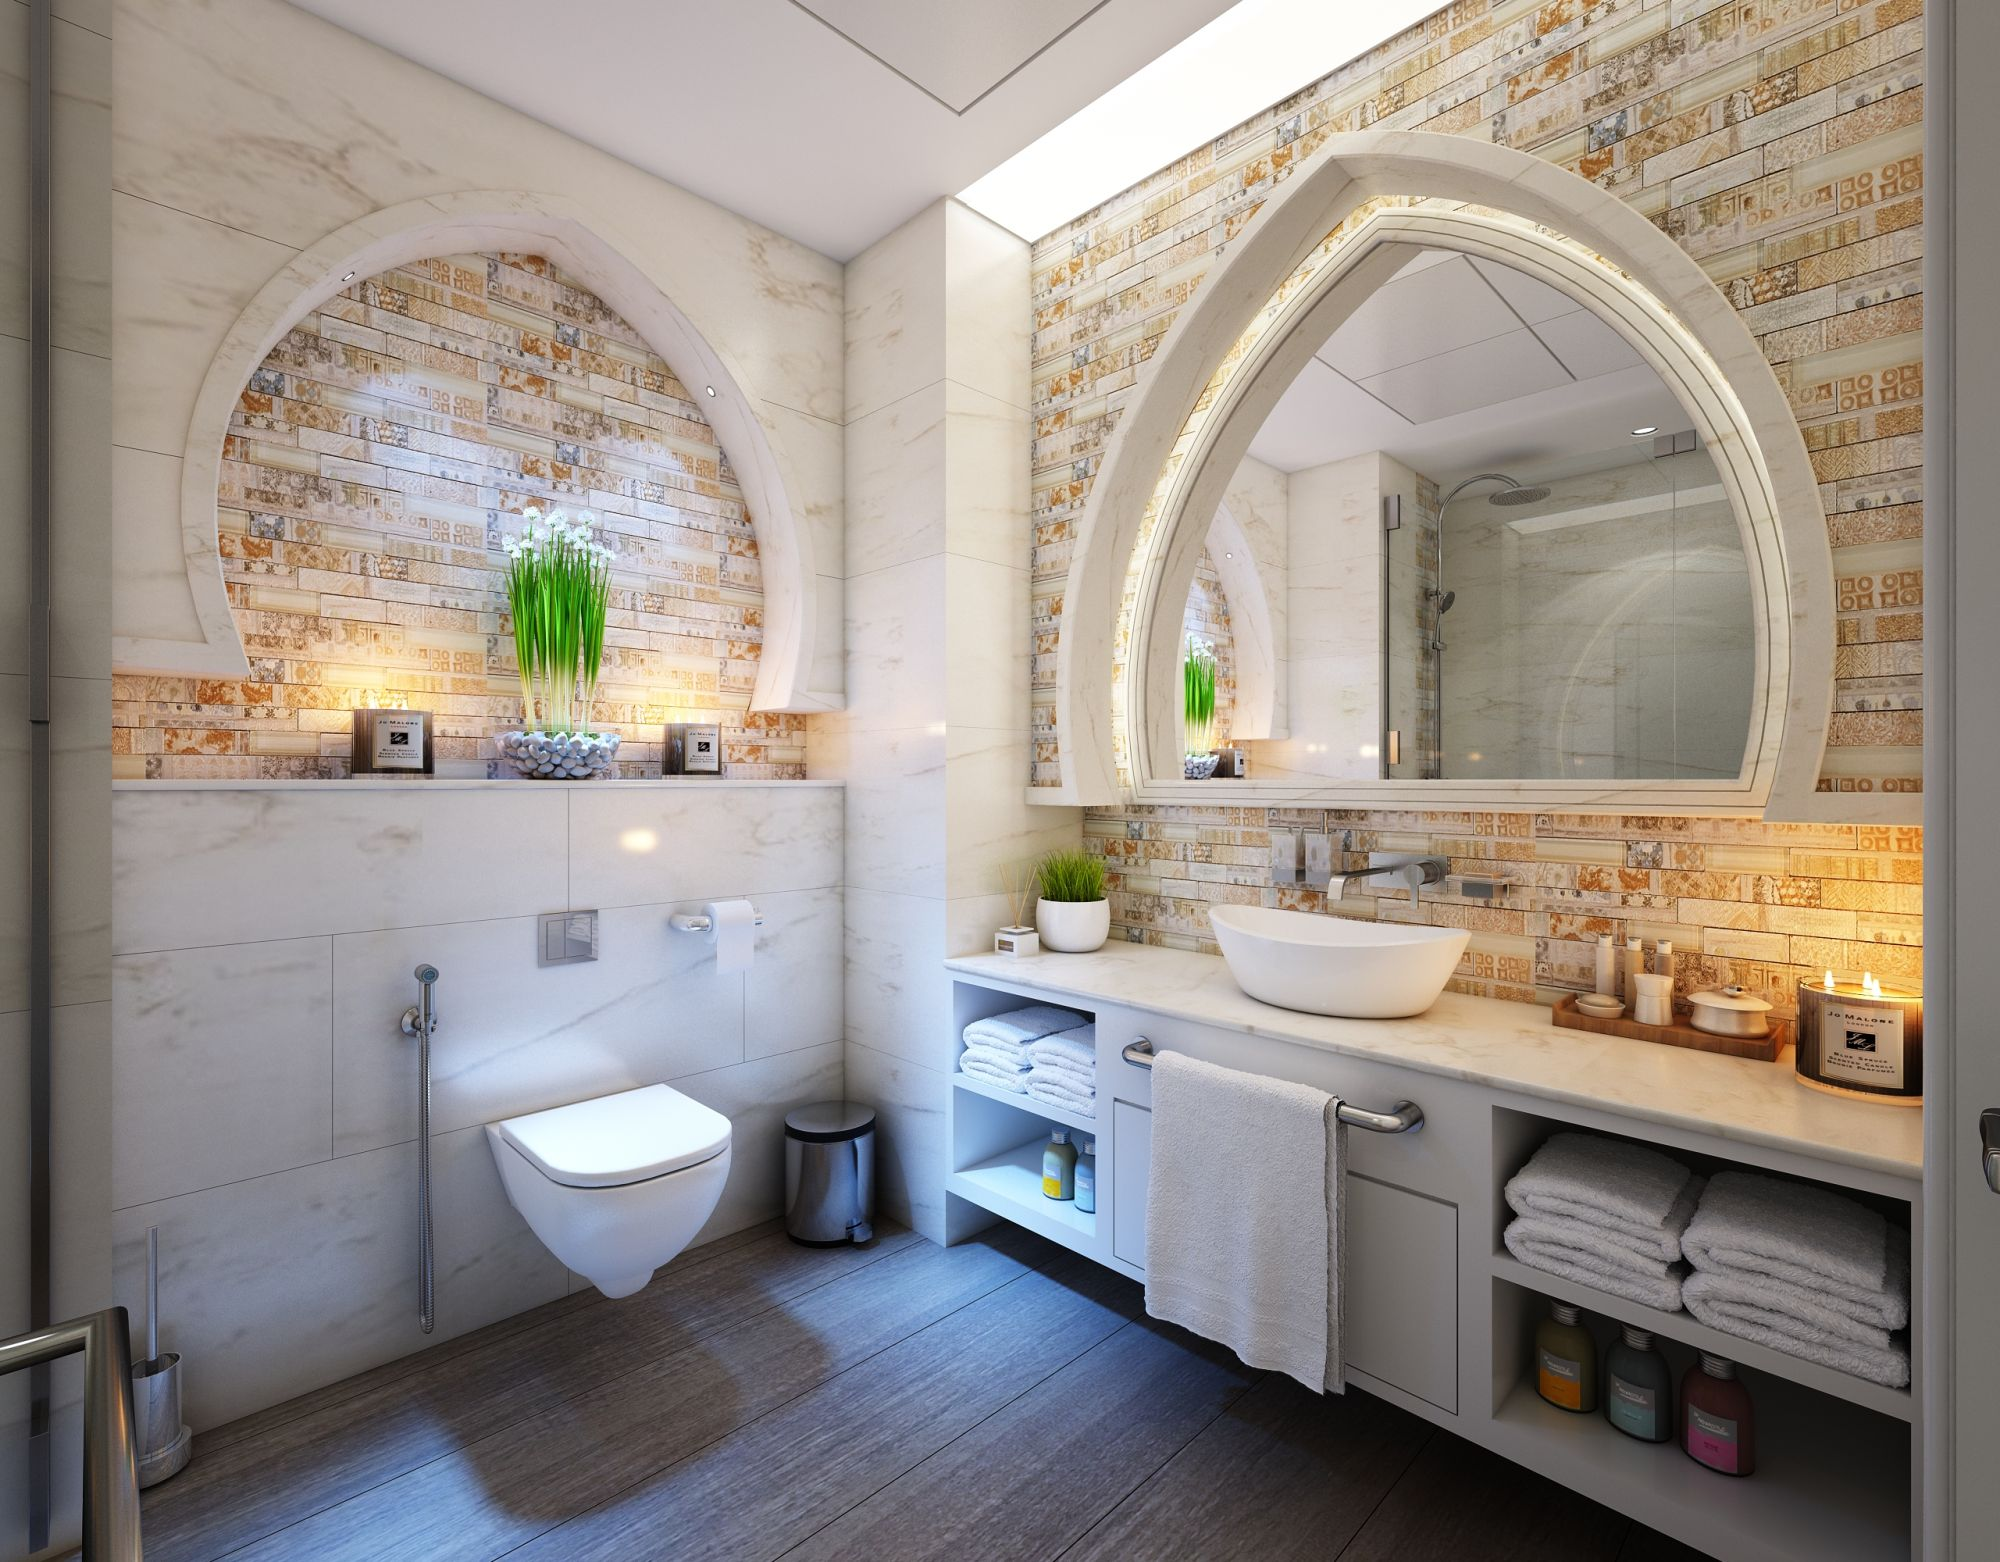 pulizia sanitari filo muro